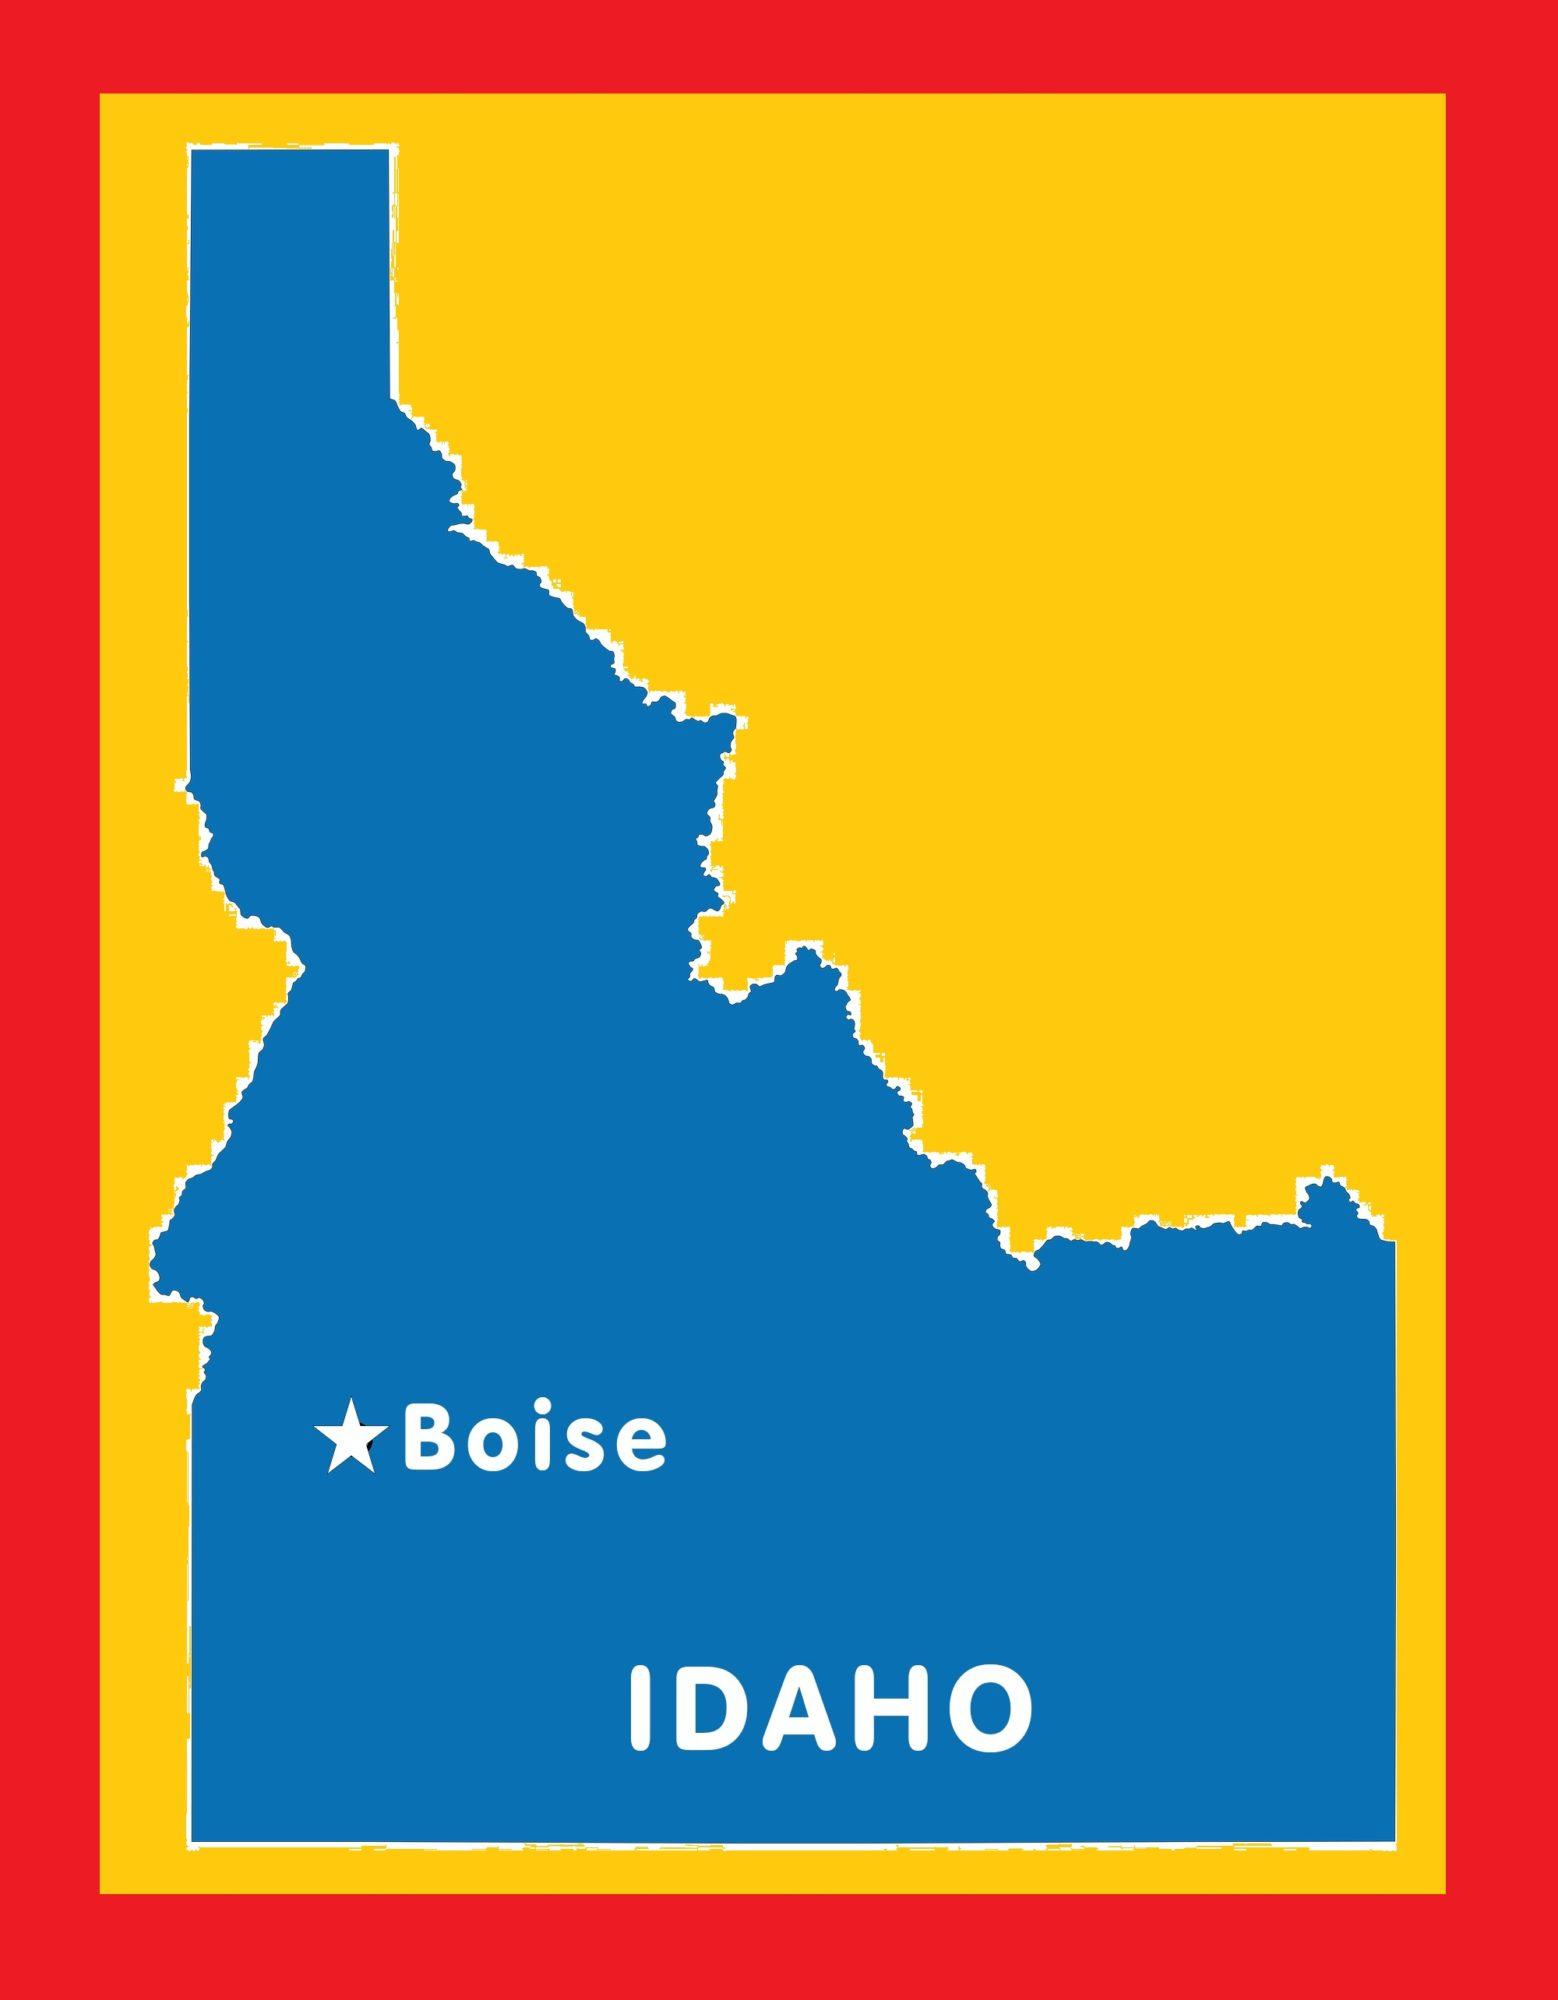 Idaho Capital Map | Large Printable and Standard Map 5